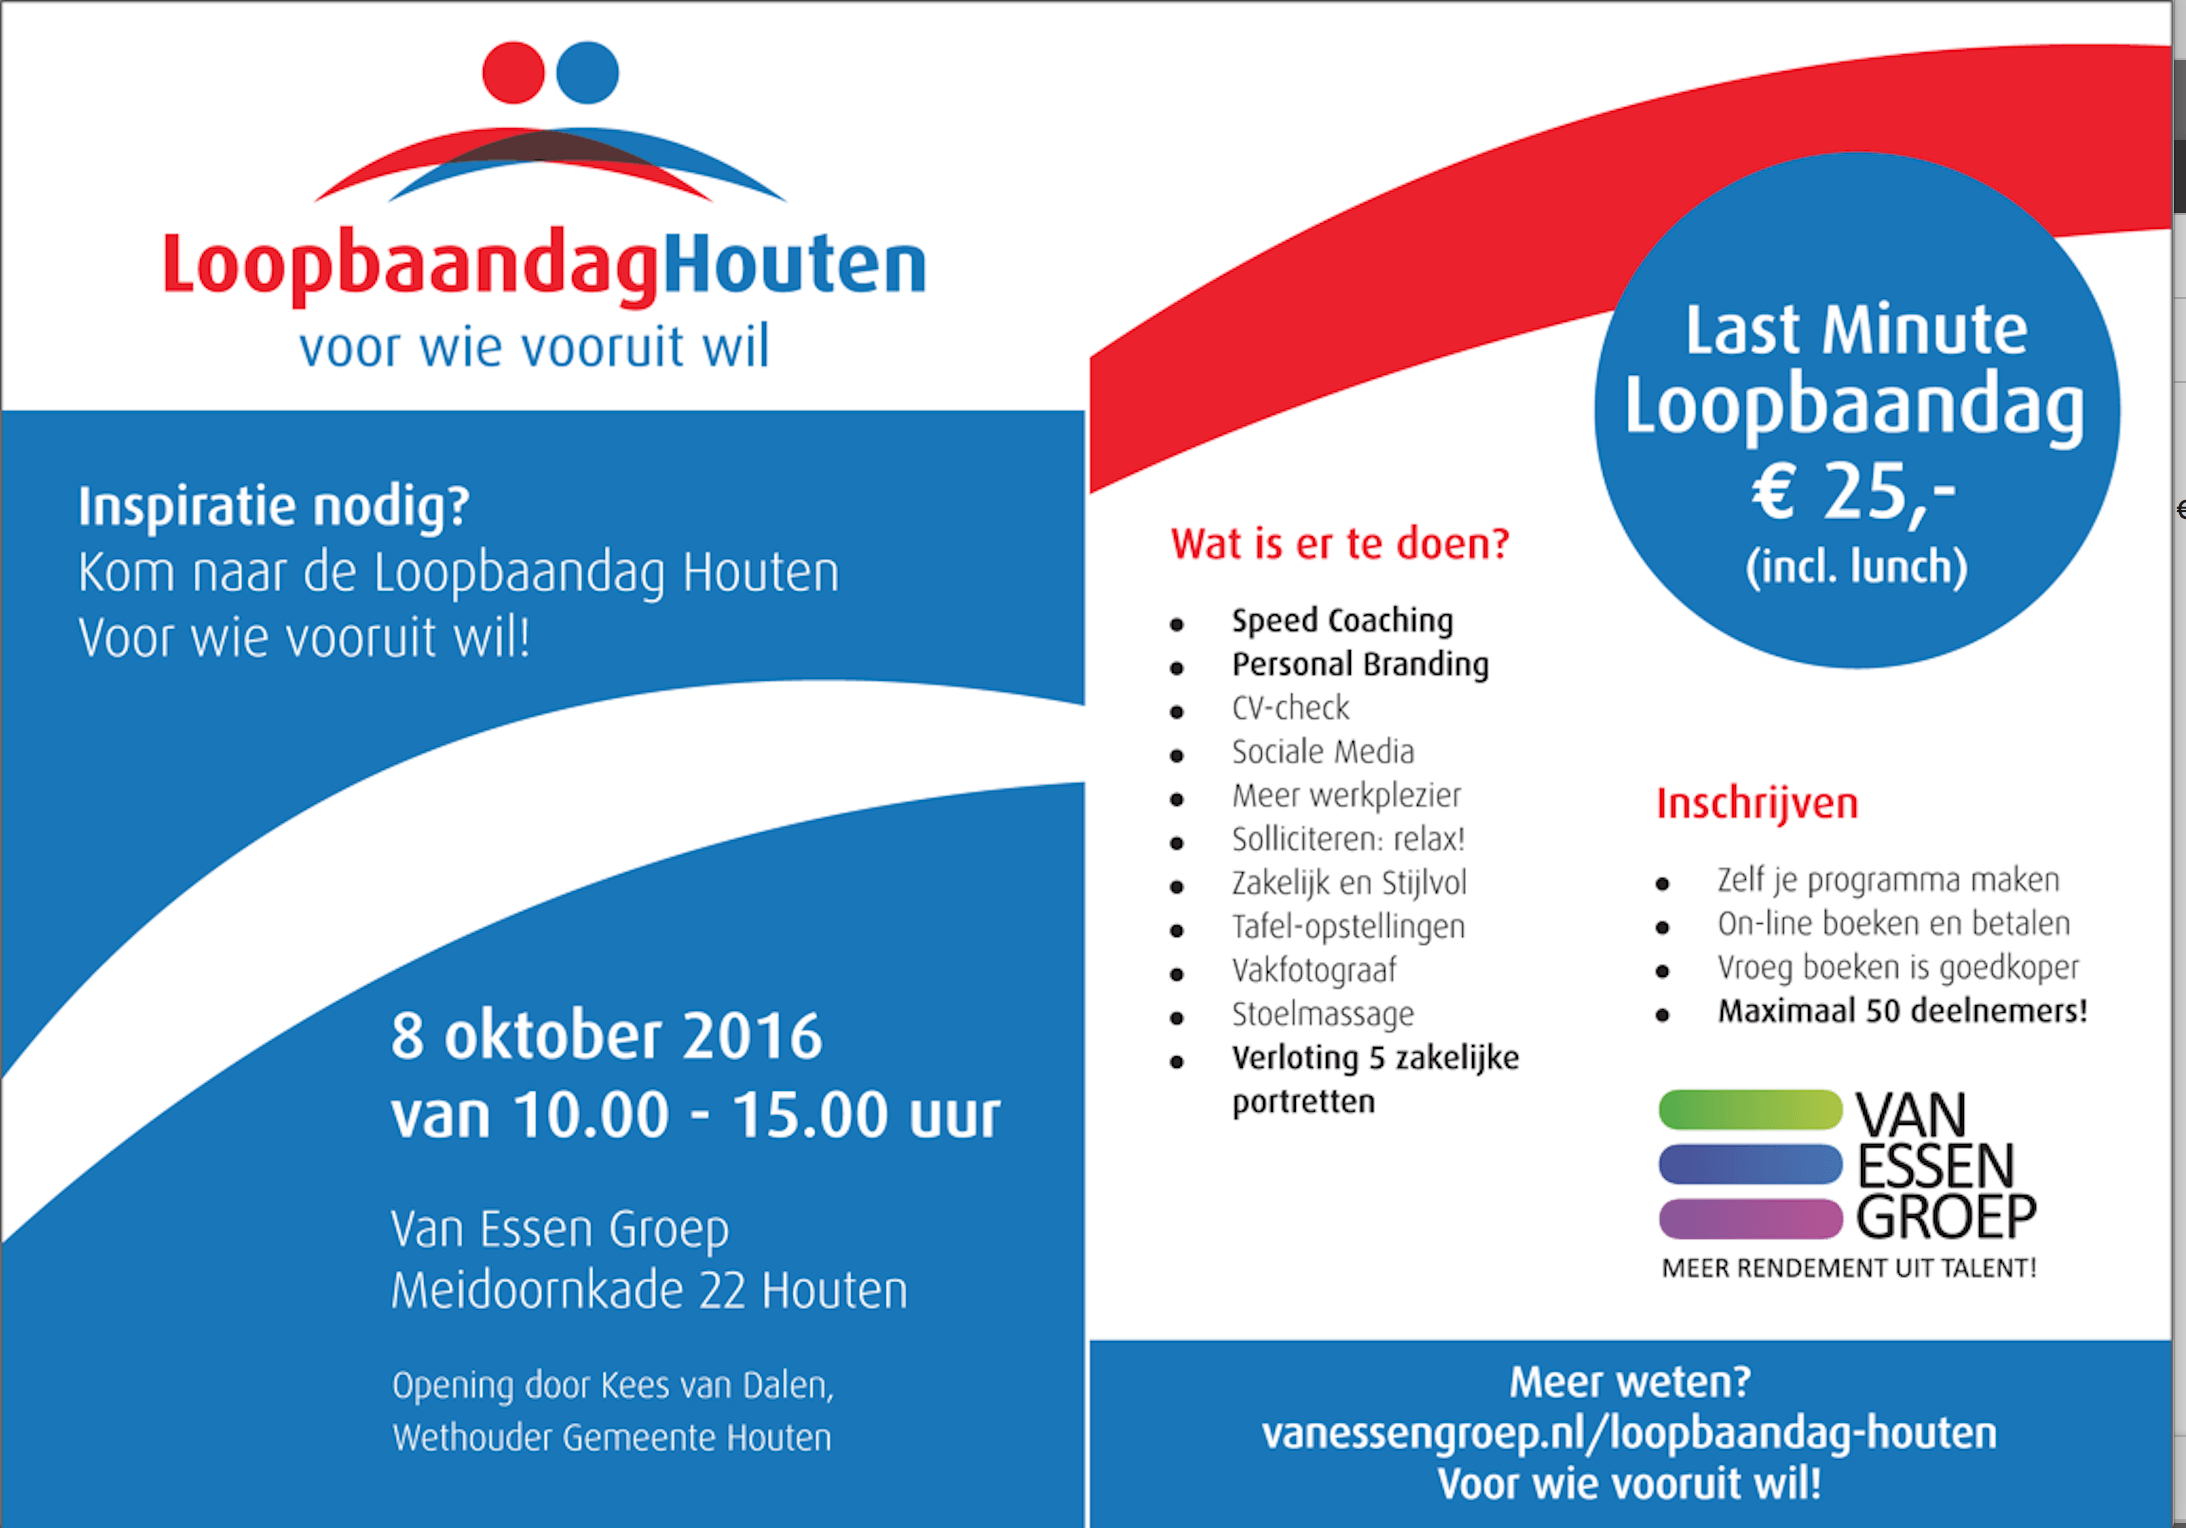 Loopbaandag Houten 8 oktober 2016 Van Essen Groep